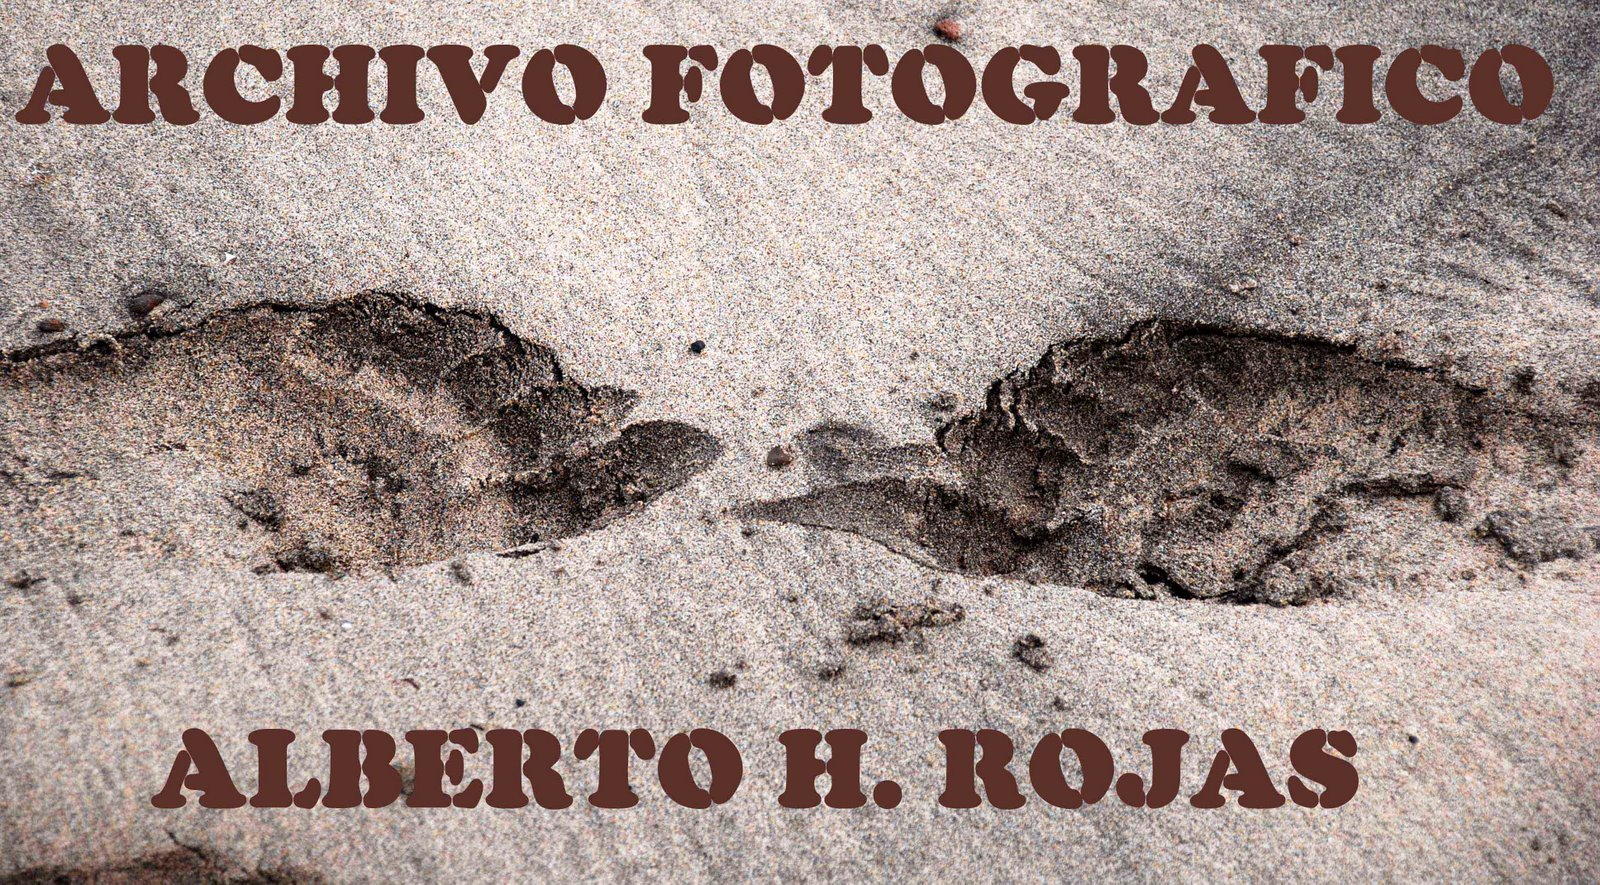 Archivo Fotografico